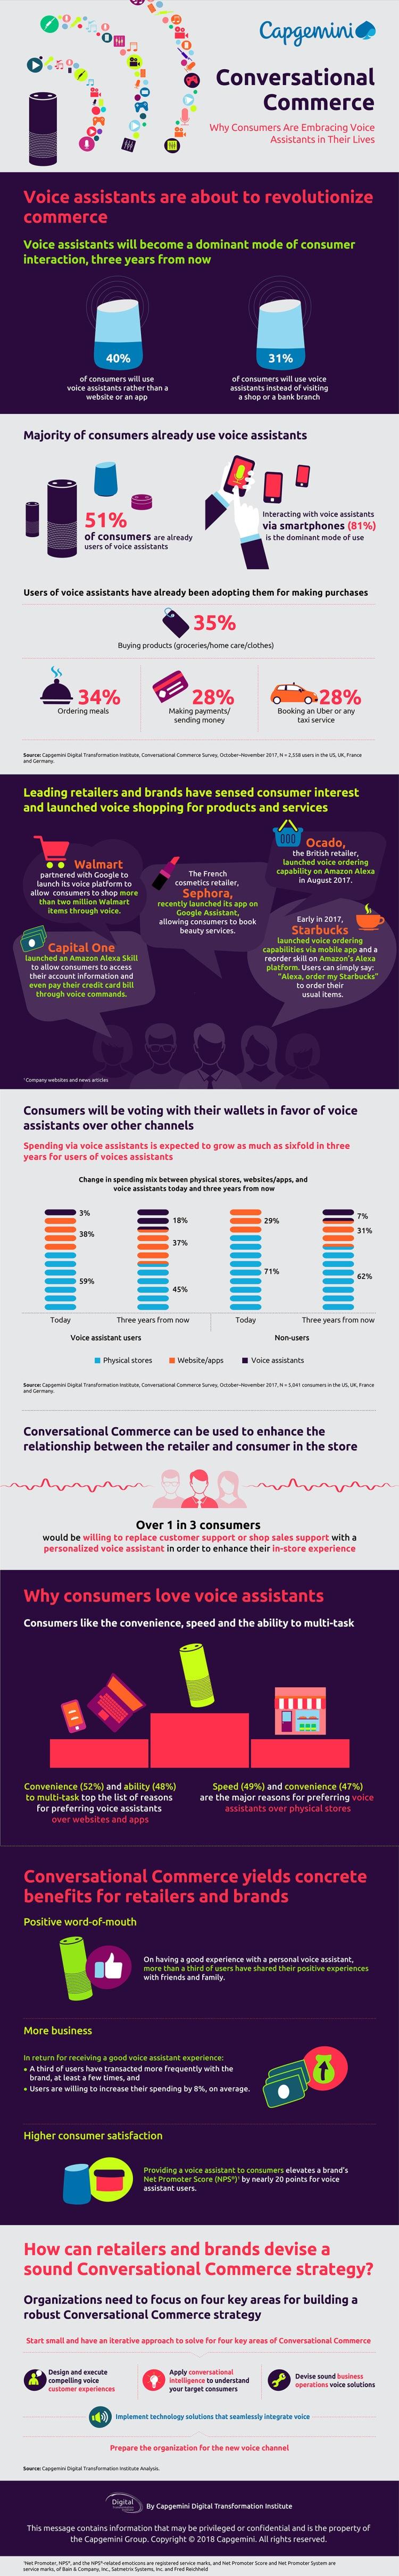 Conversational Commerce Infographic_2018-01-04_V4